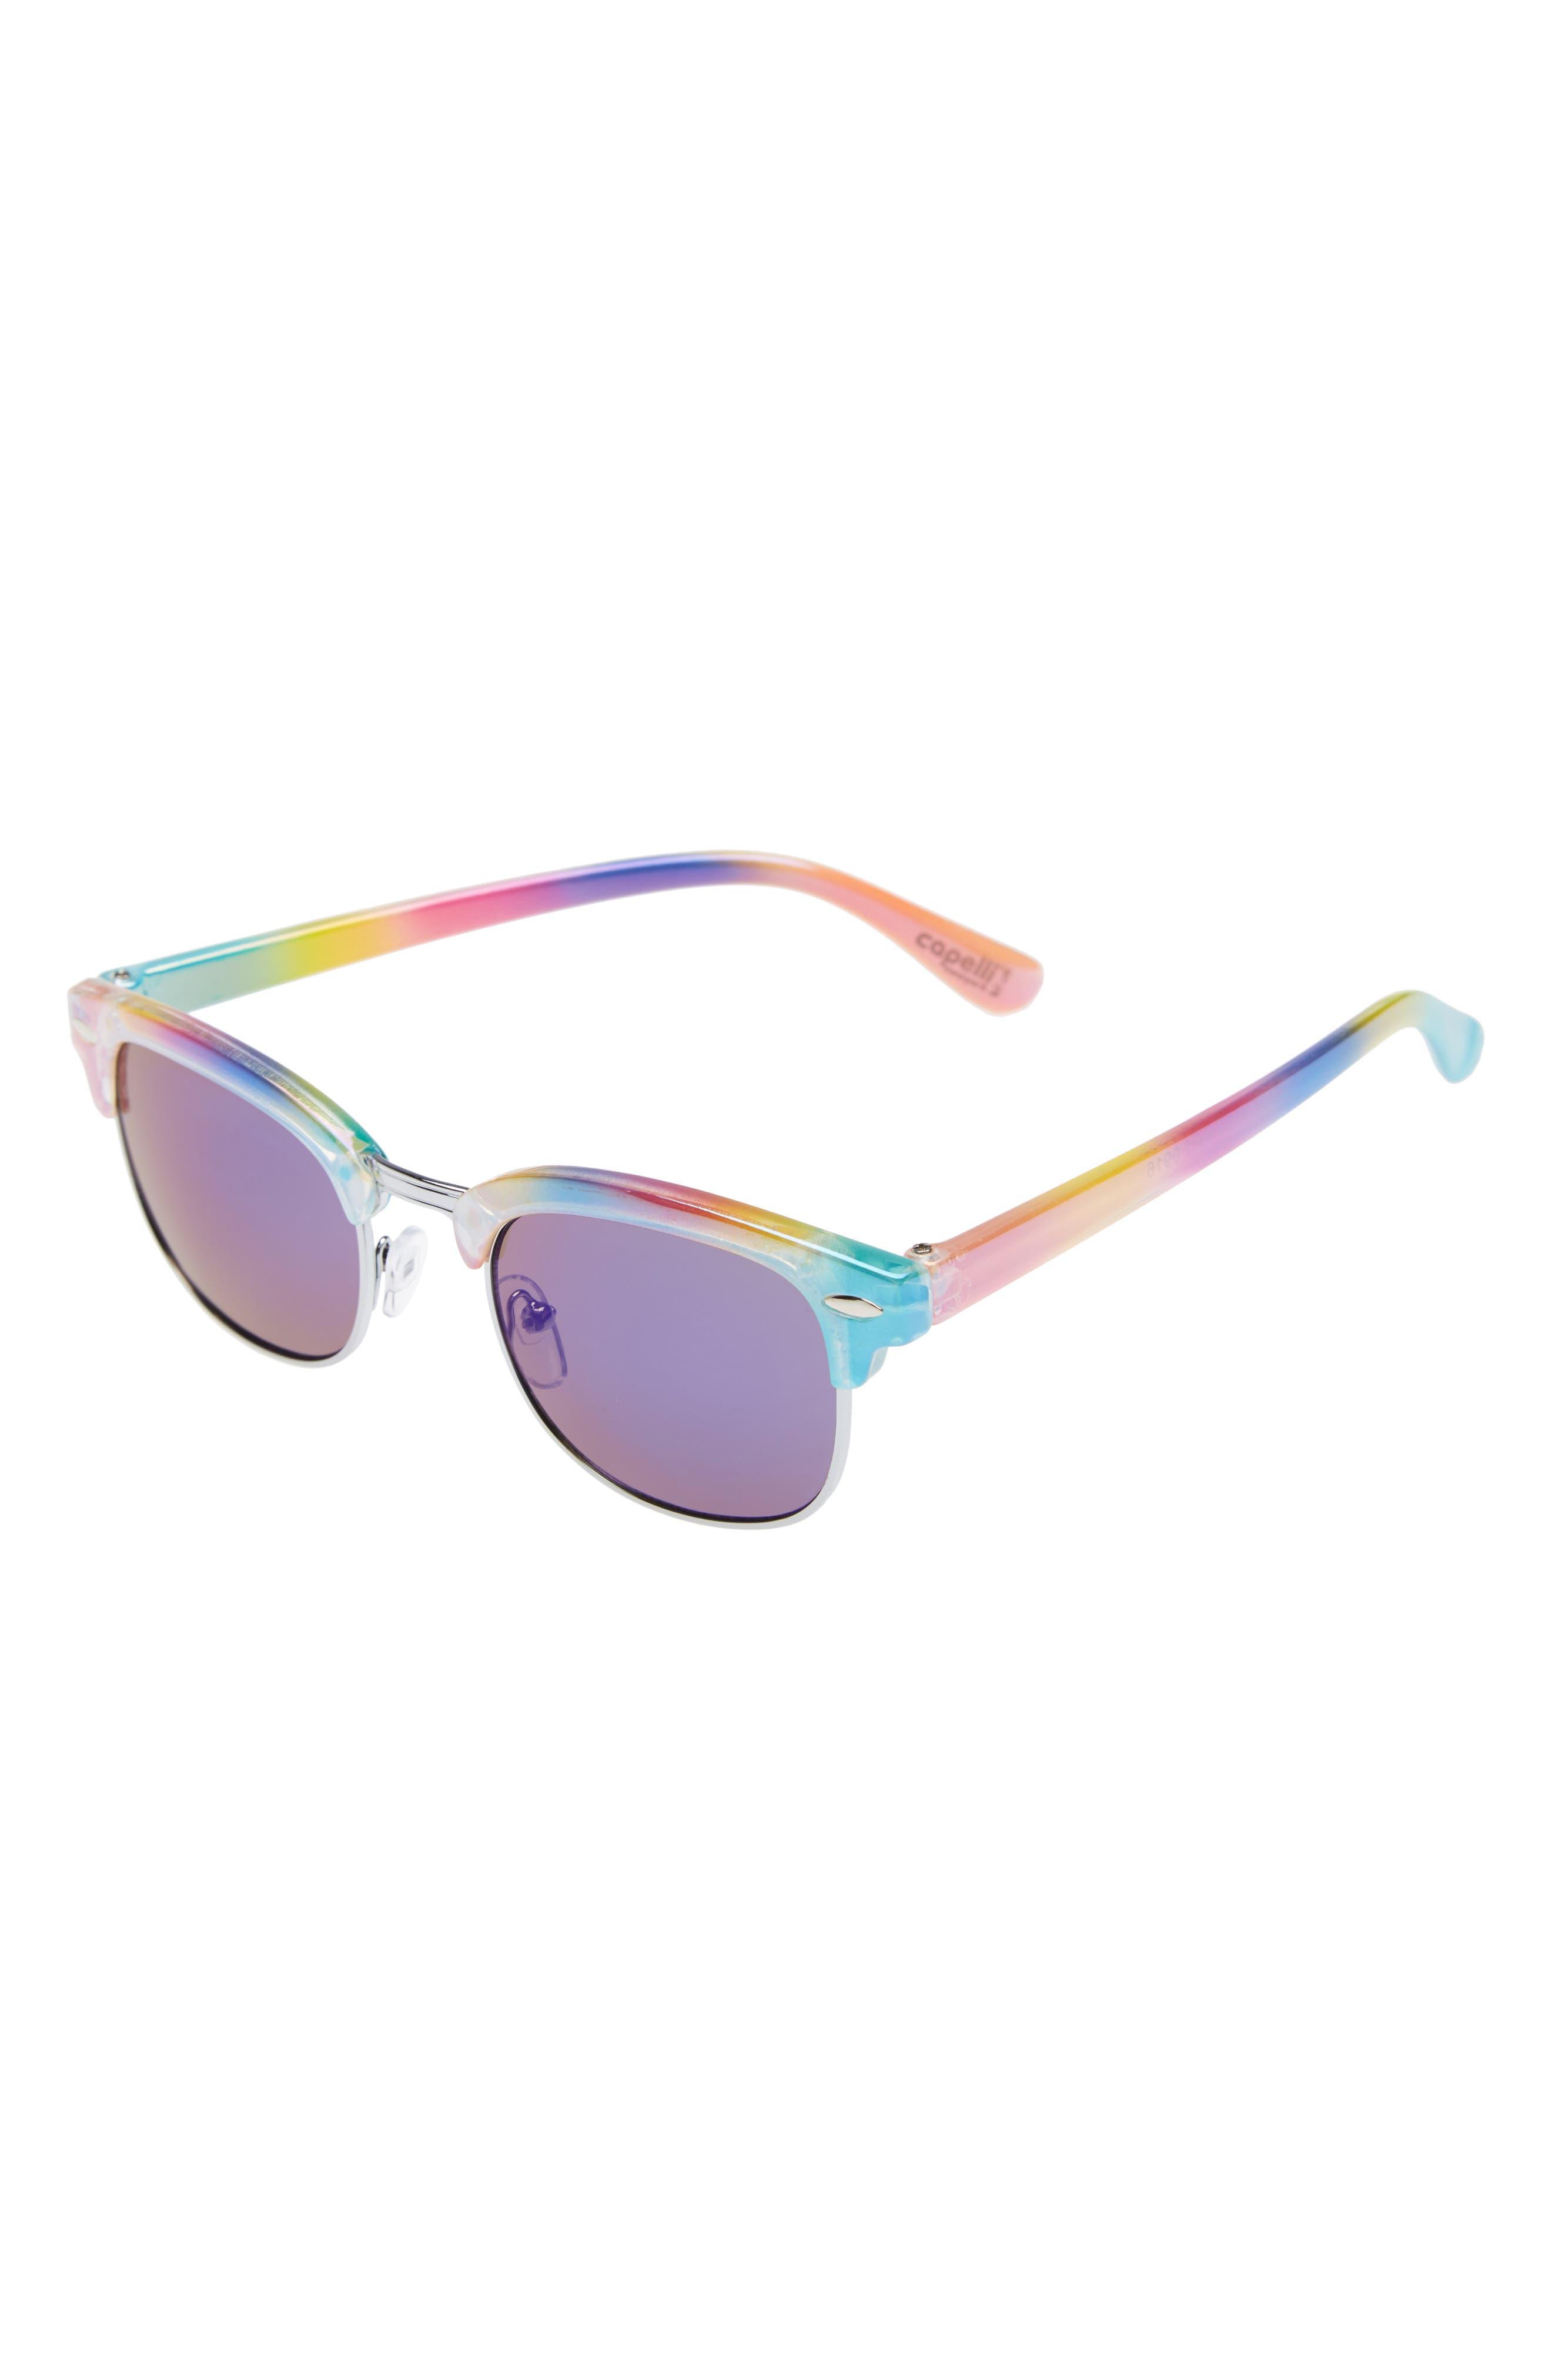 Capelli of New York Retro Sunglasses,                             Main thumbnail 1, color,                             650